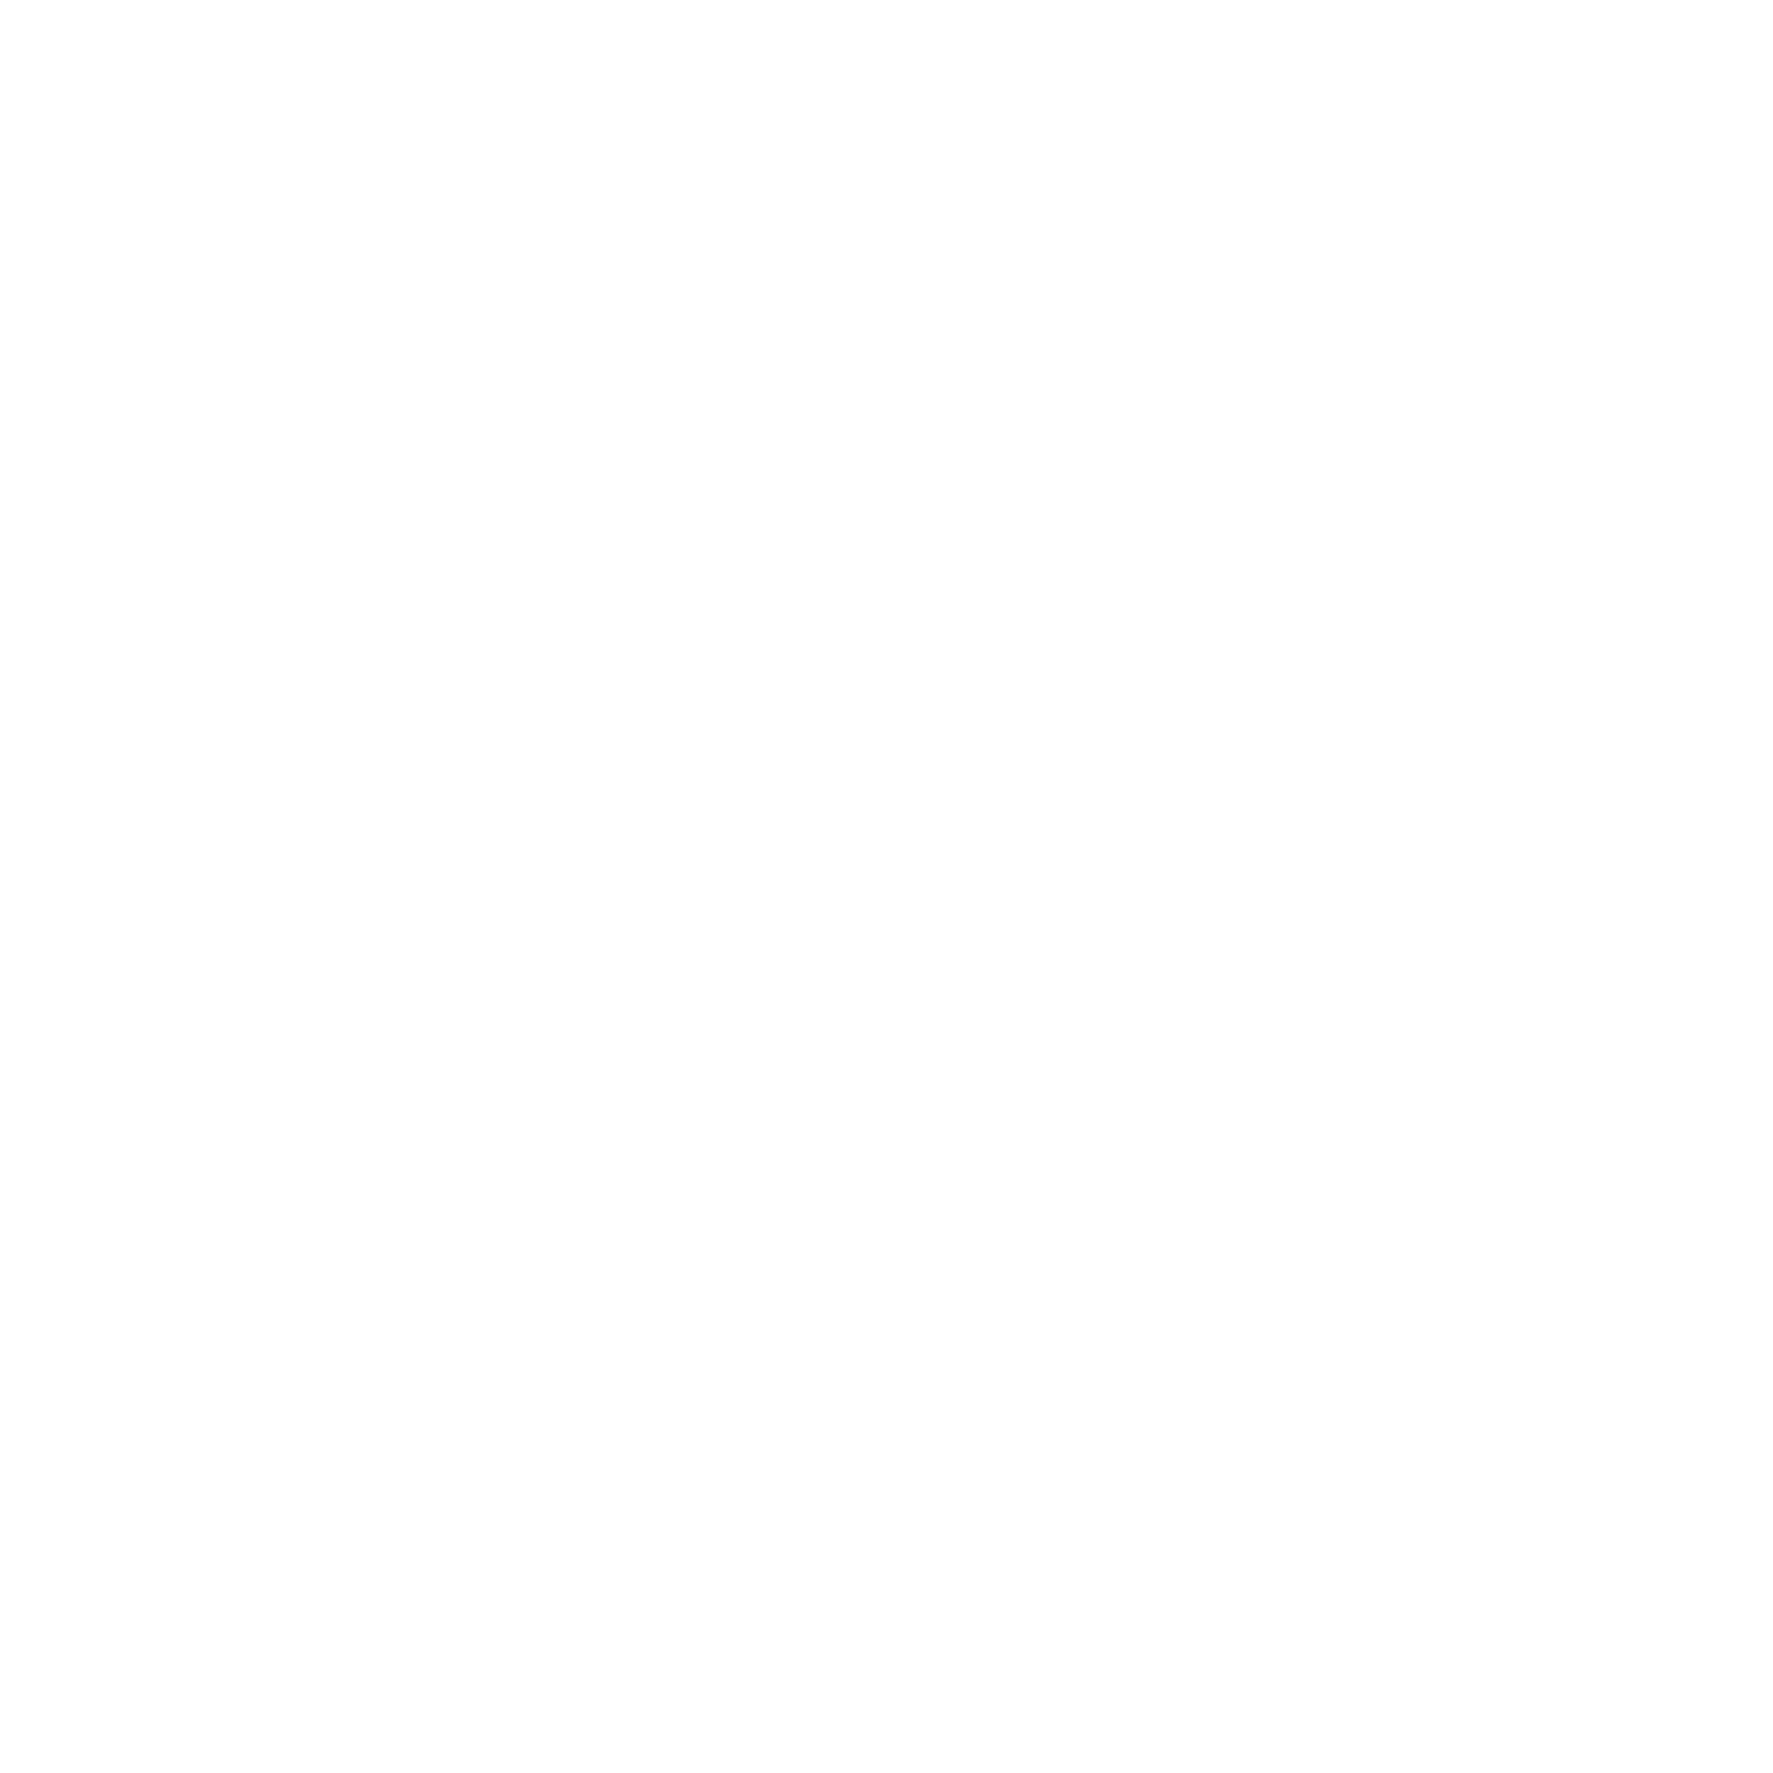 DL_mietservice-13